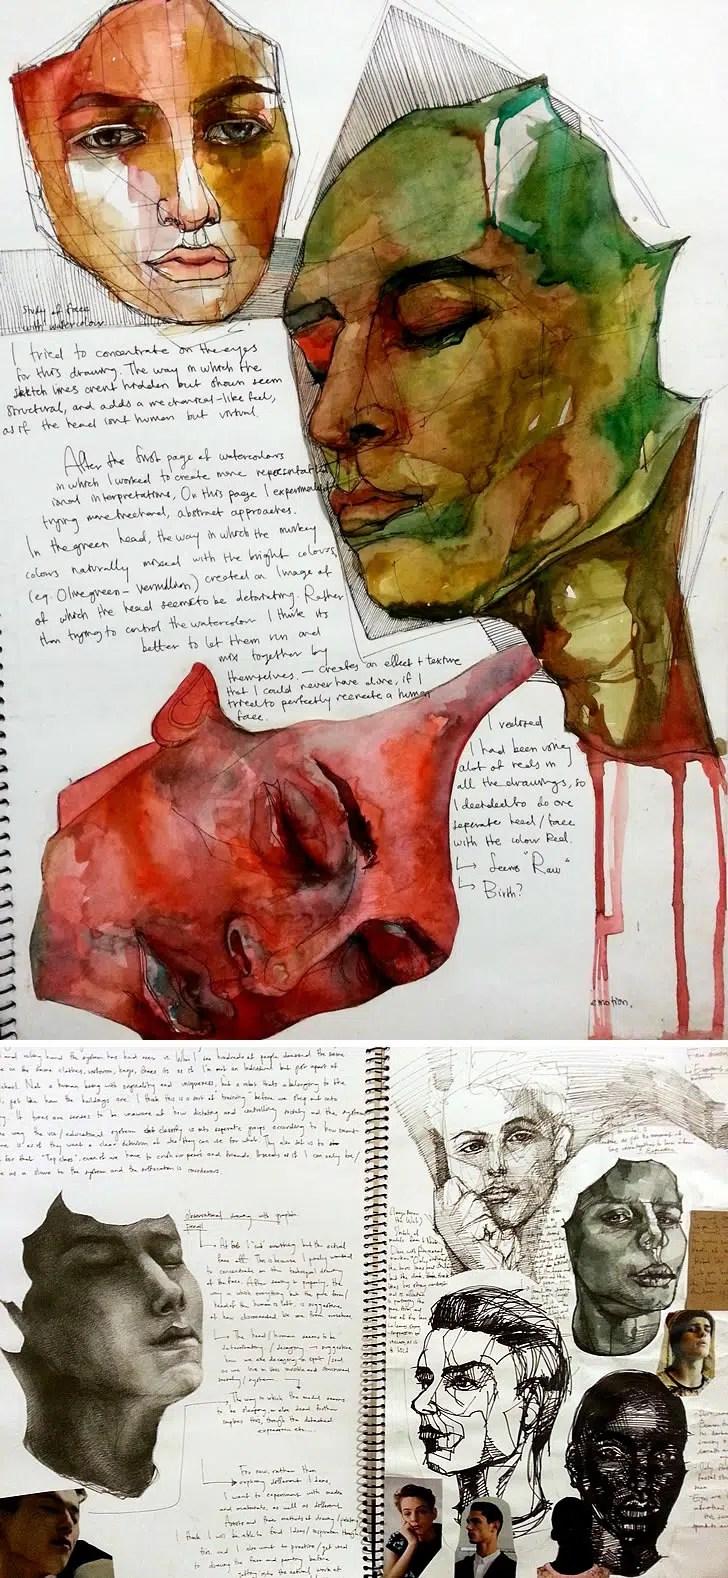 VCE Studio Arts folio by Heesu Kim